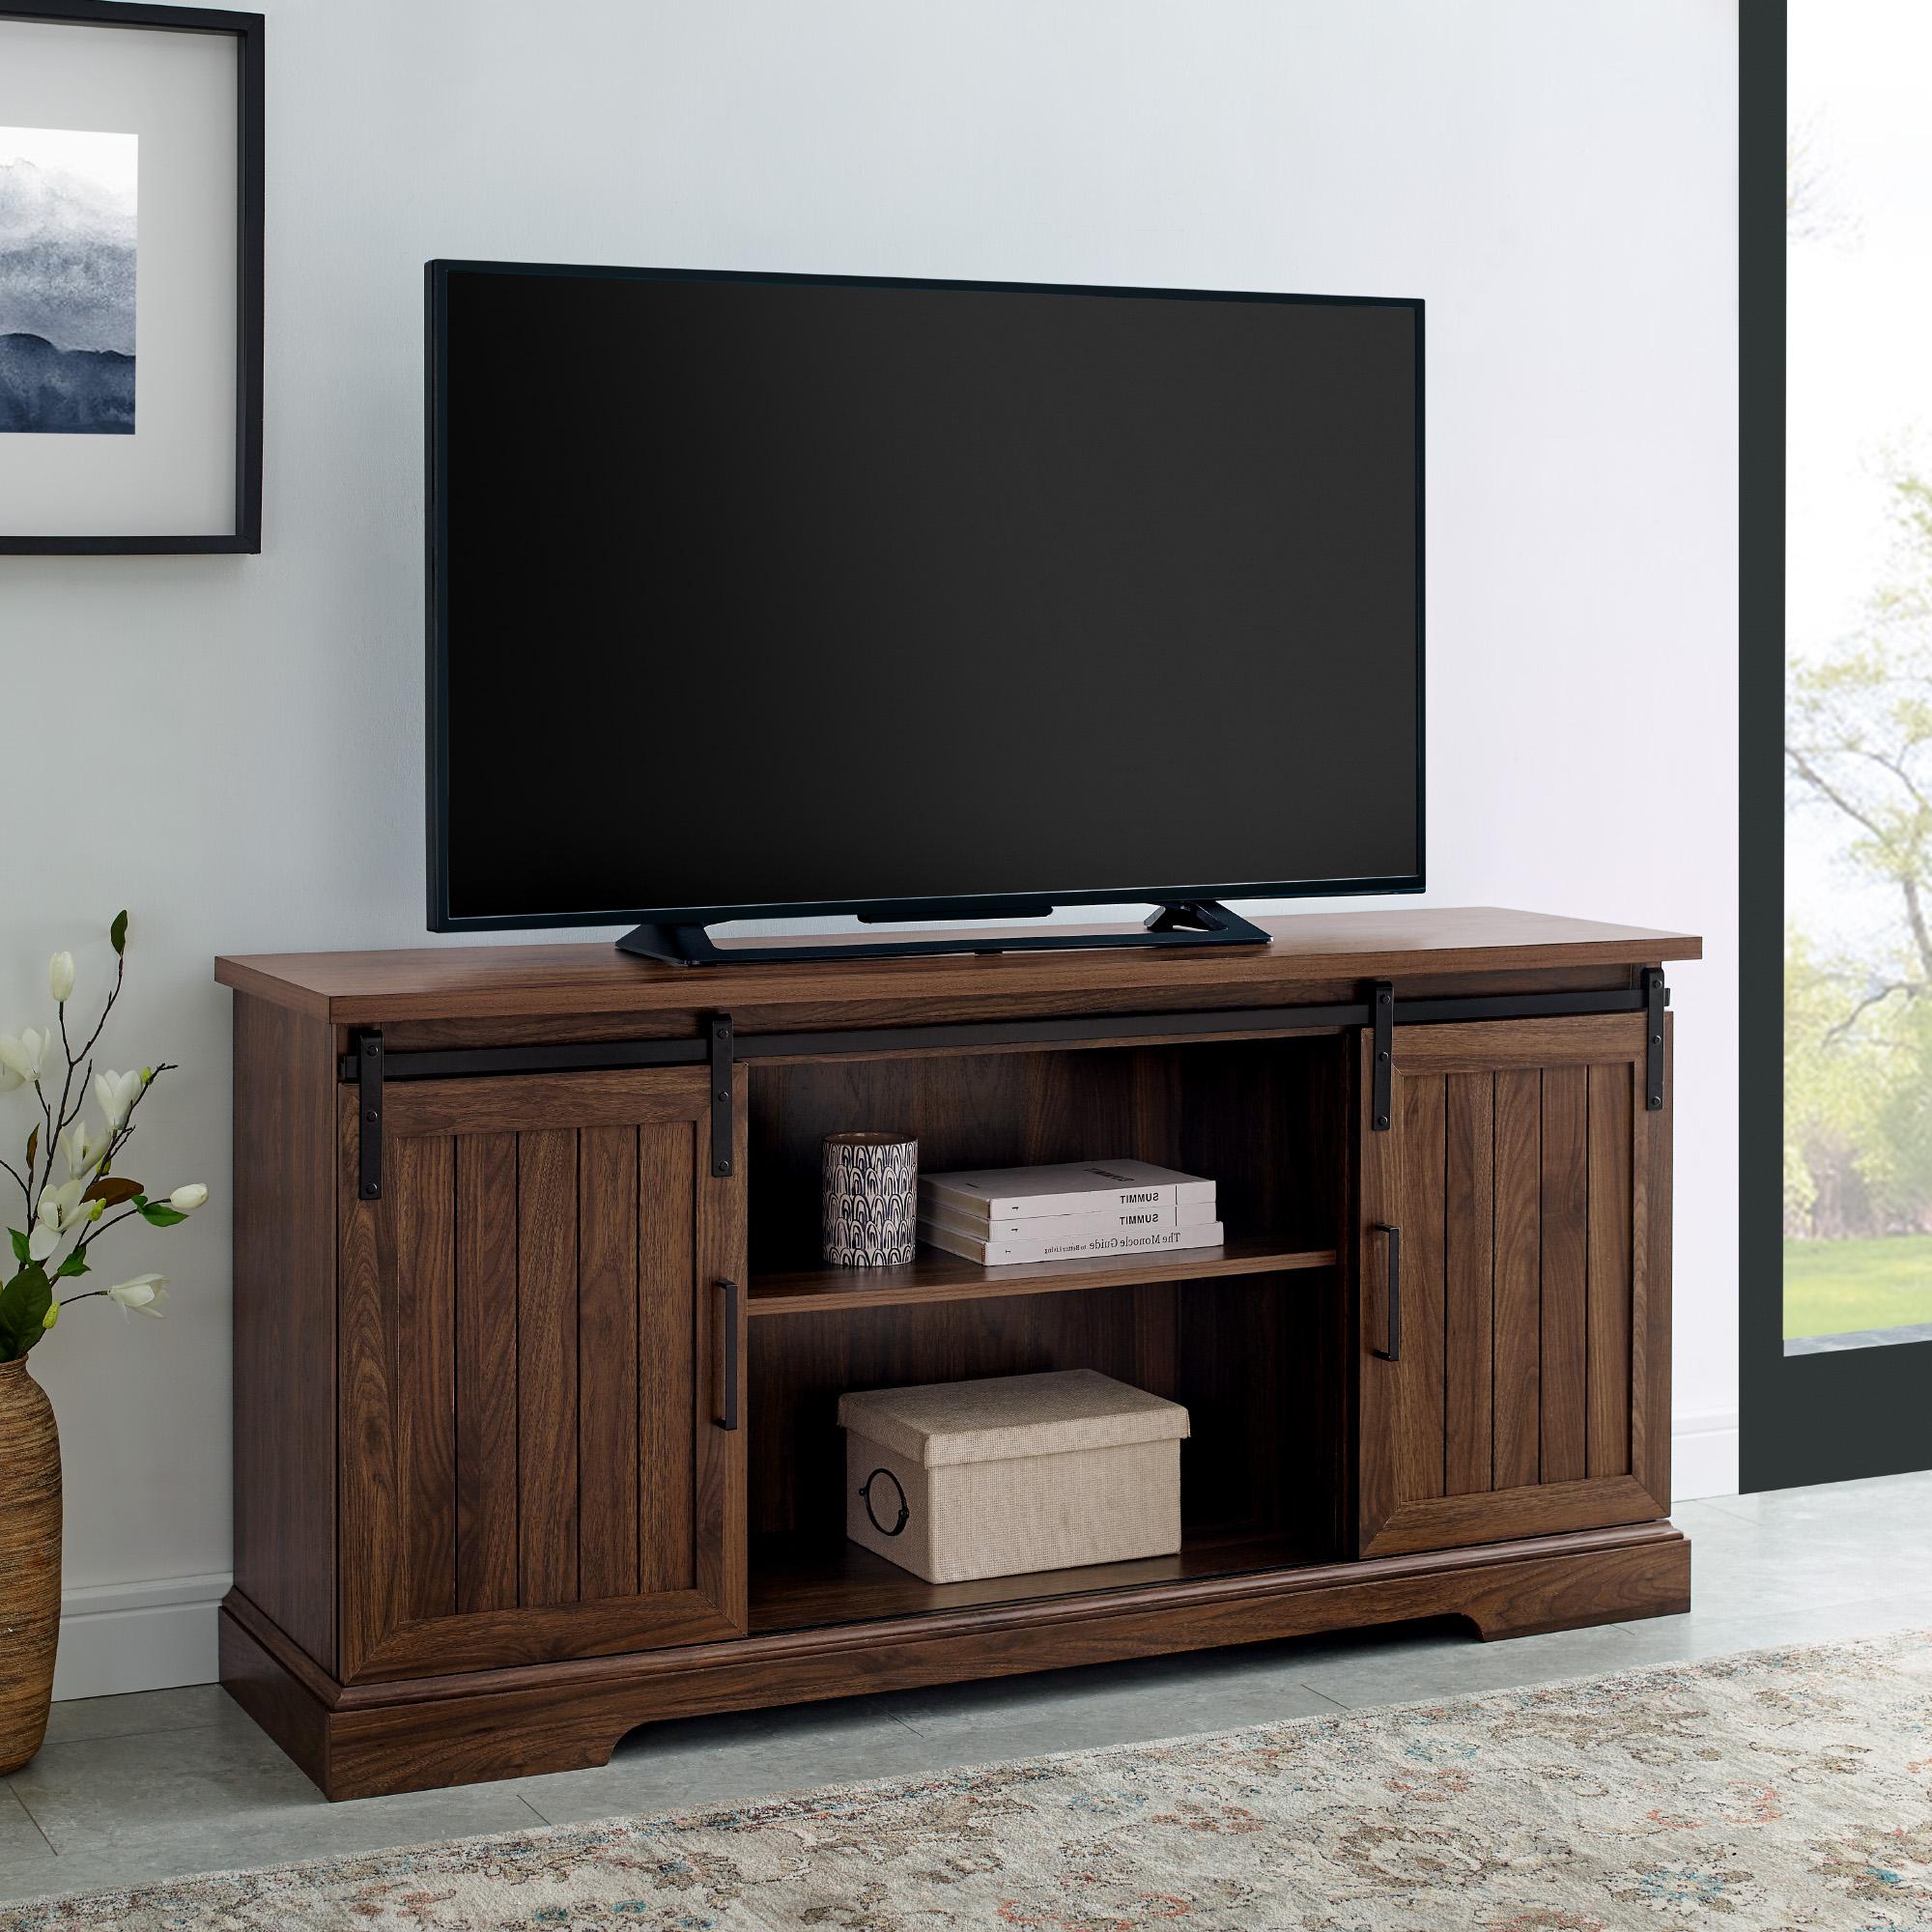 Manor Park Grooved Sliding Door Tv Stand For Tvs Up To 65 With Regard To Grooved Door Corner Tv Stands (View 2 of 20)